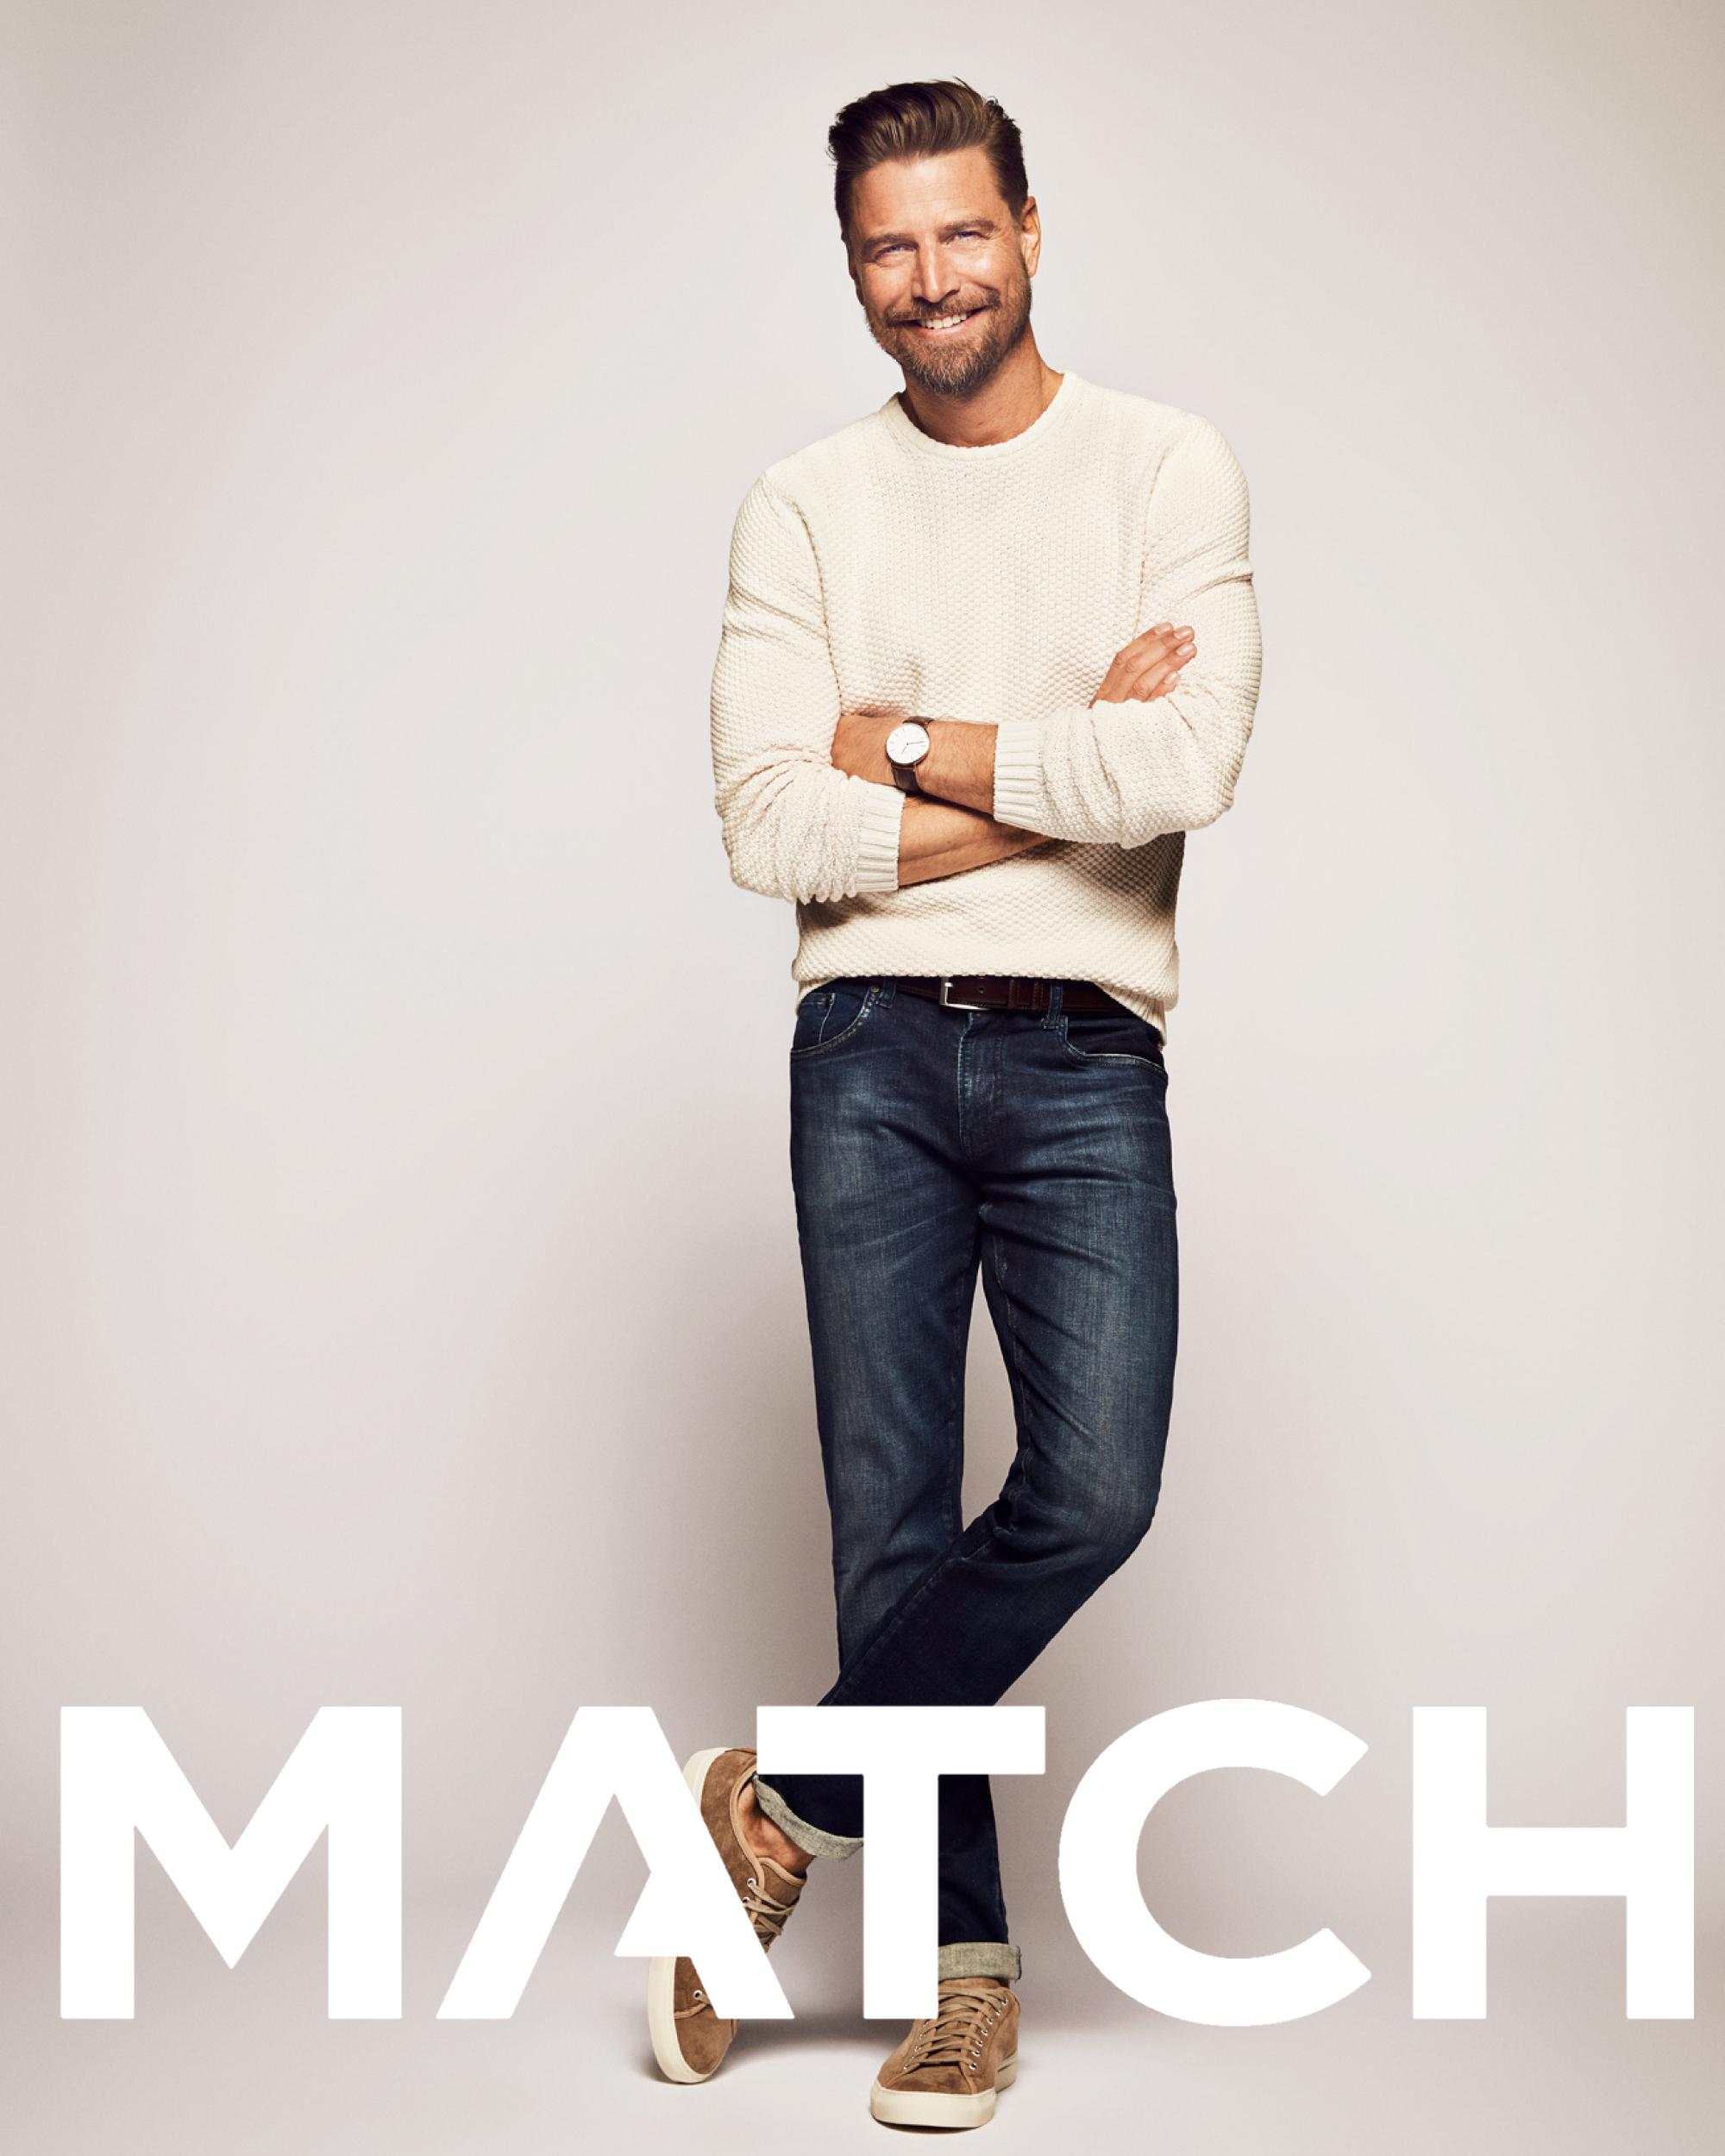 match117.jpg